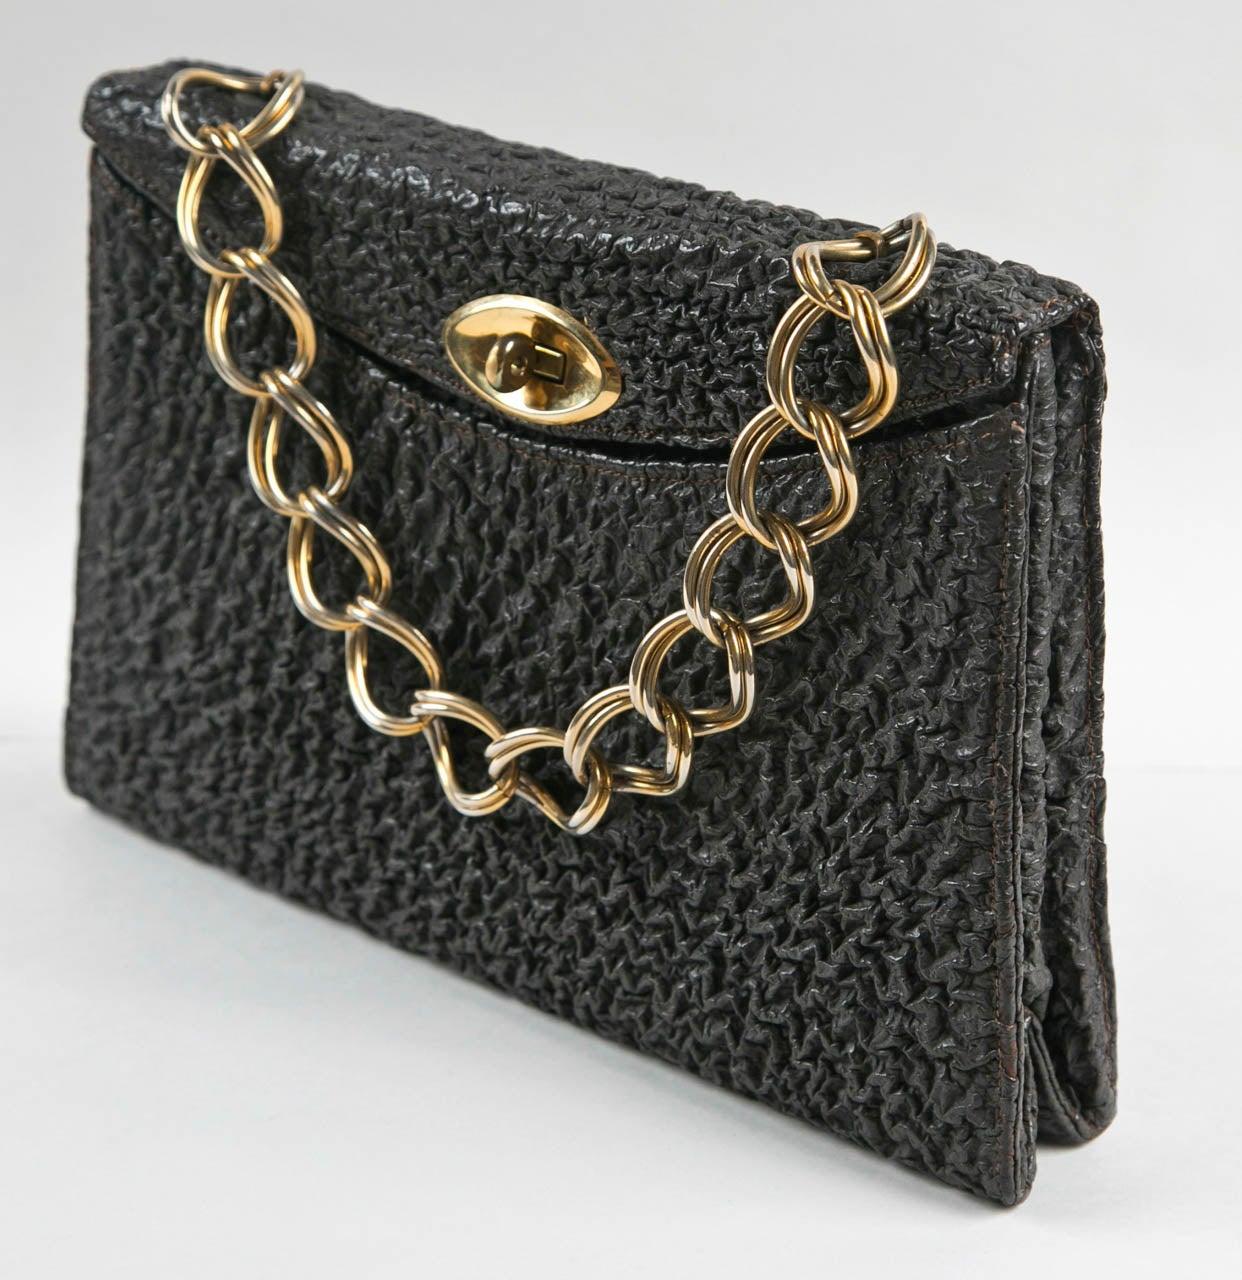 Jacomo Paris Wrinkled Leather Handbag 2